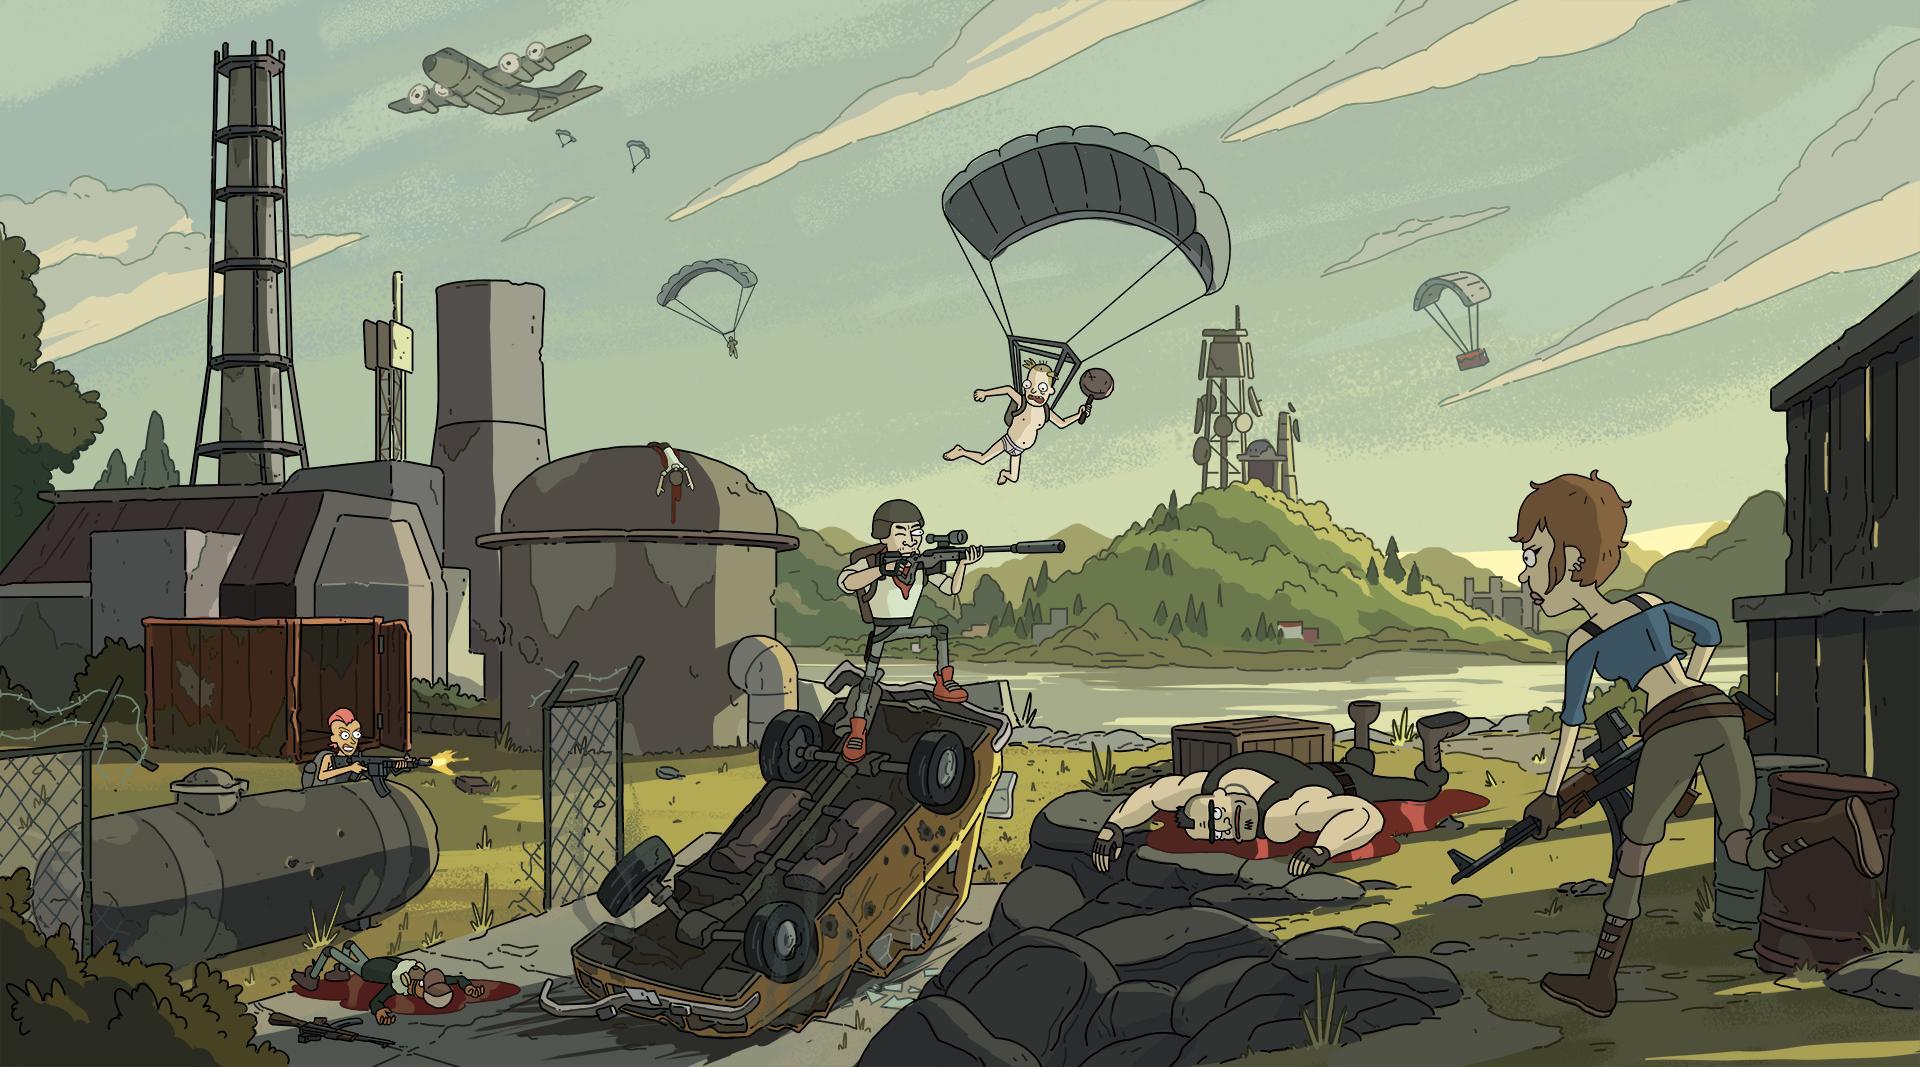 Pubg Parachute Wallpaper Fondos De Pantalla Videojuegos Arte Digital Pubg